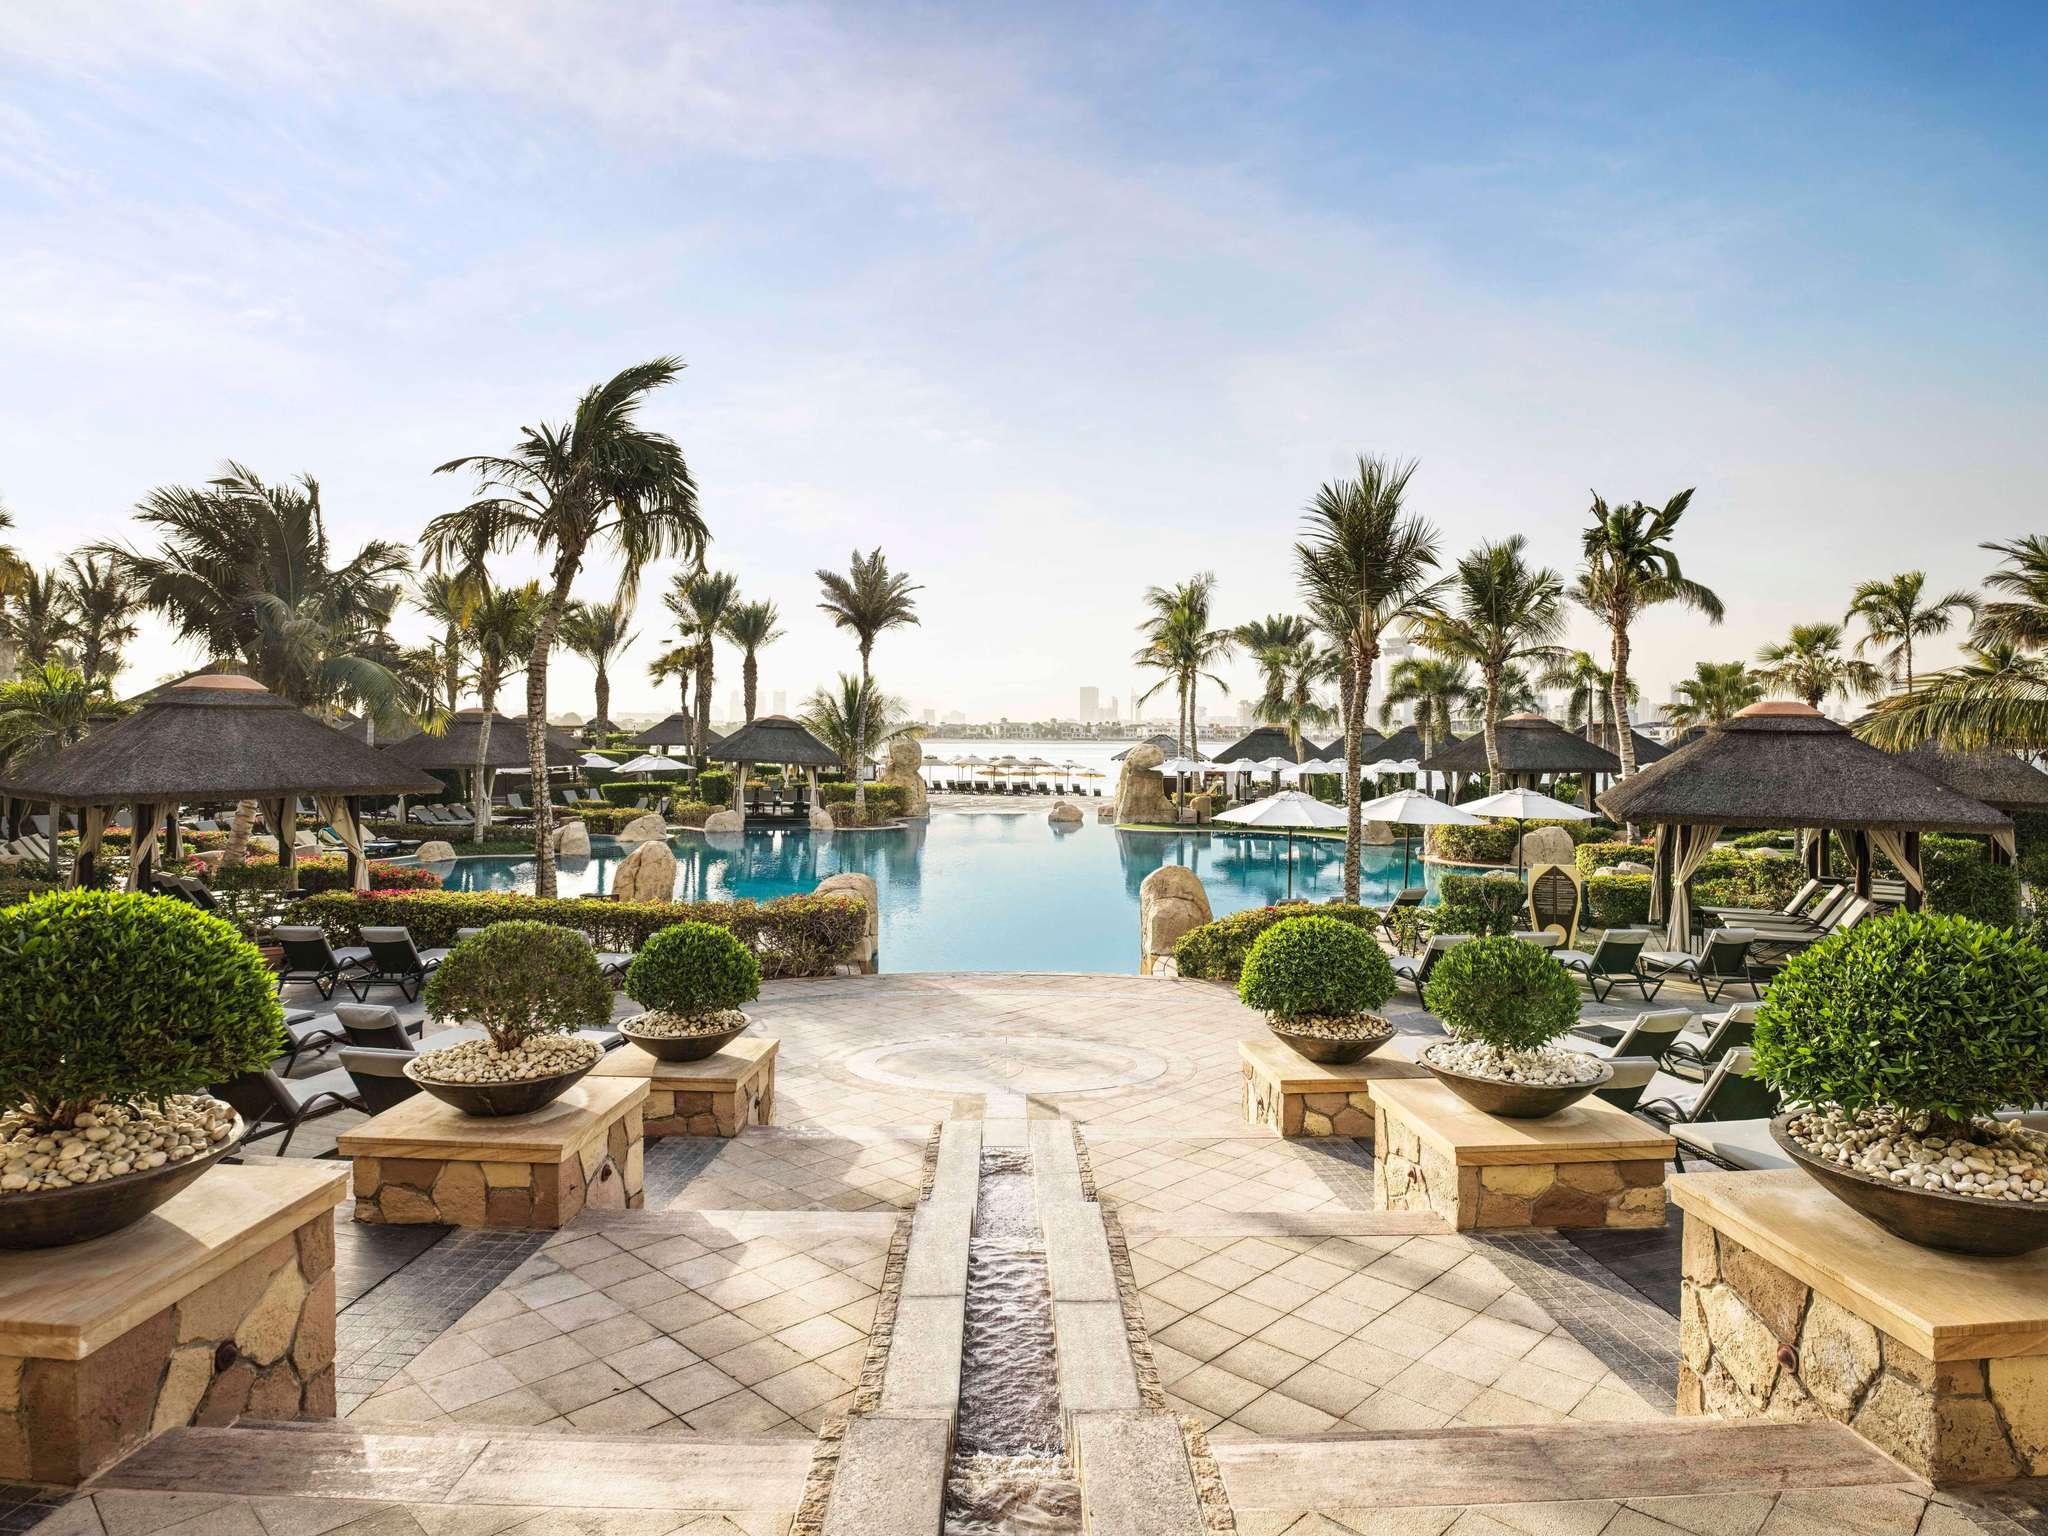 36 Palms Boutique Retreat Hotel In Dubai Sofitel Dubai The Palm Resort Spa